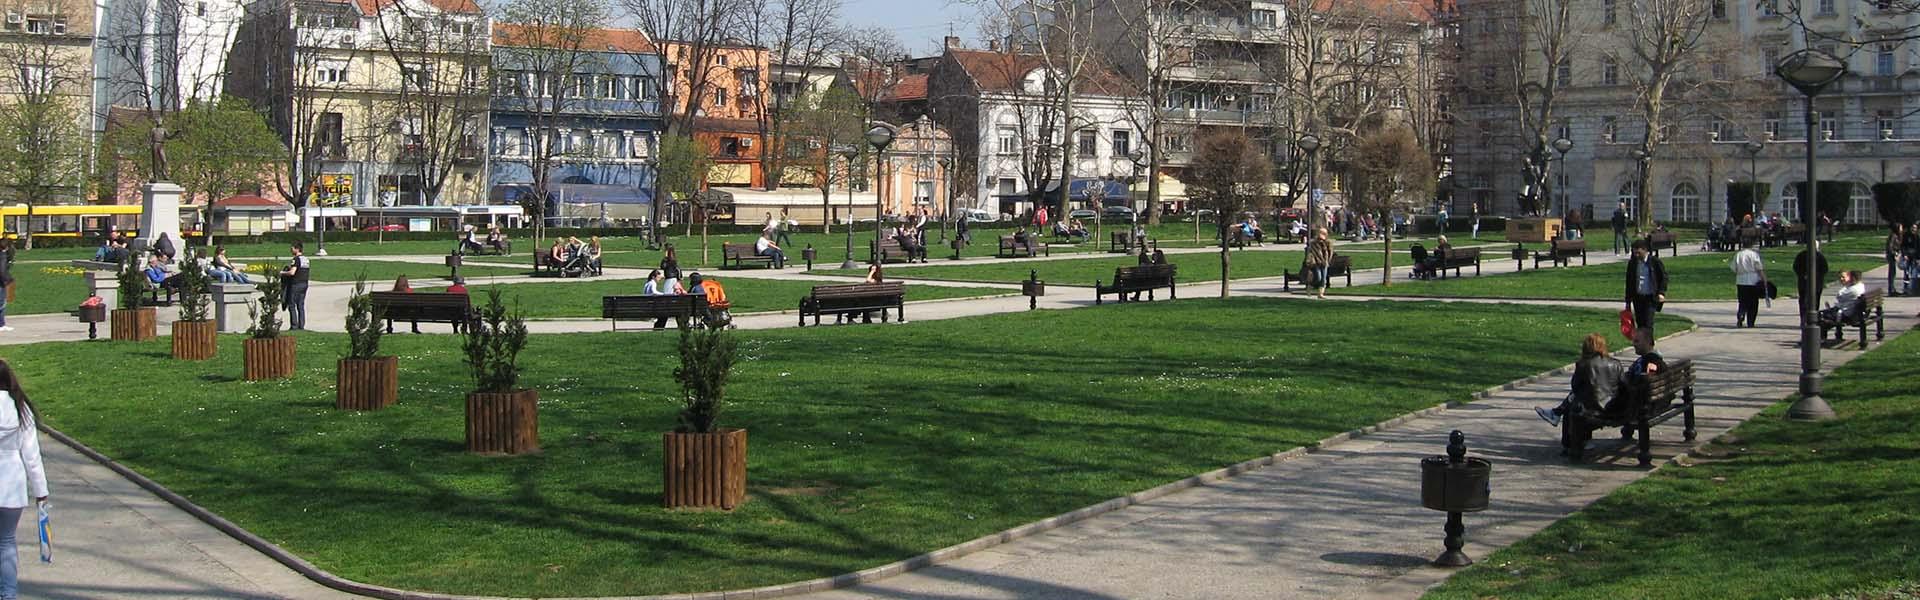 Dostava hrane Vukov spomenik | Beograd